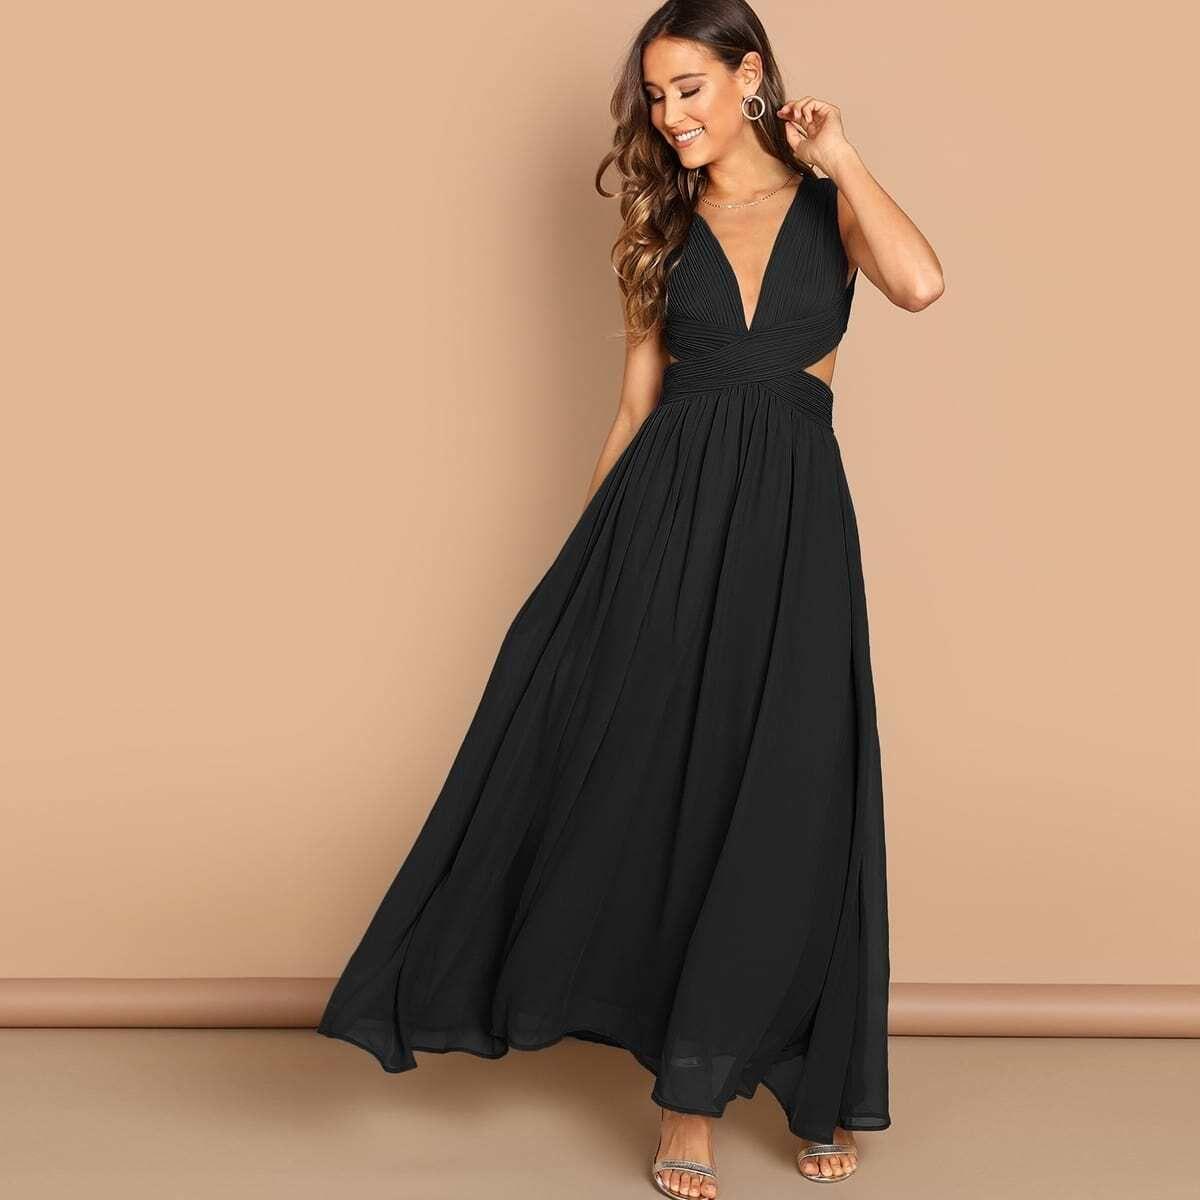 Pin on Women Fashion Group